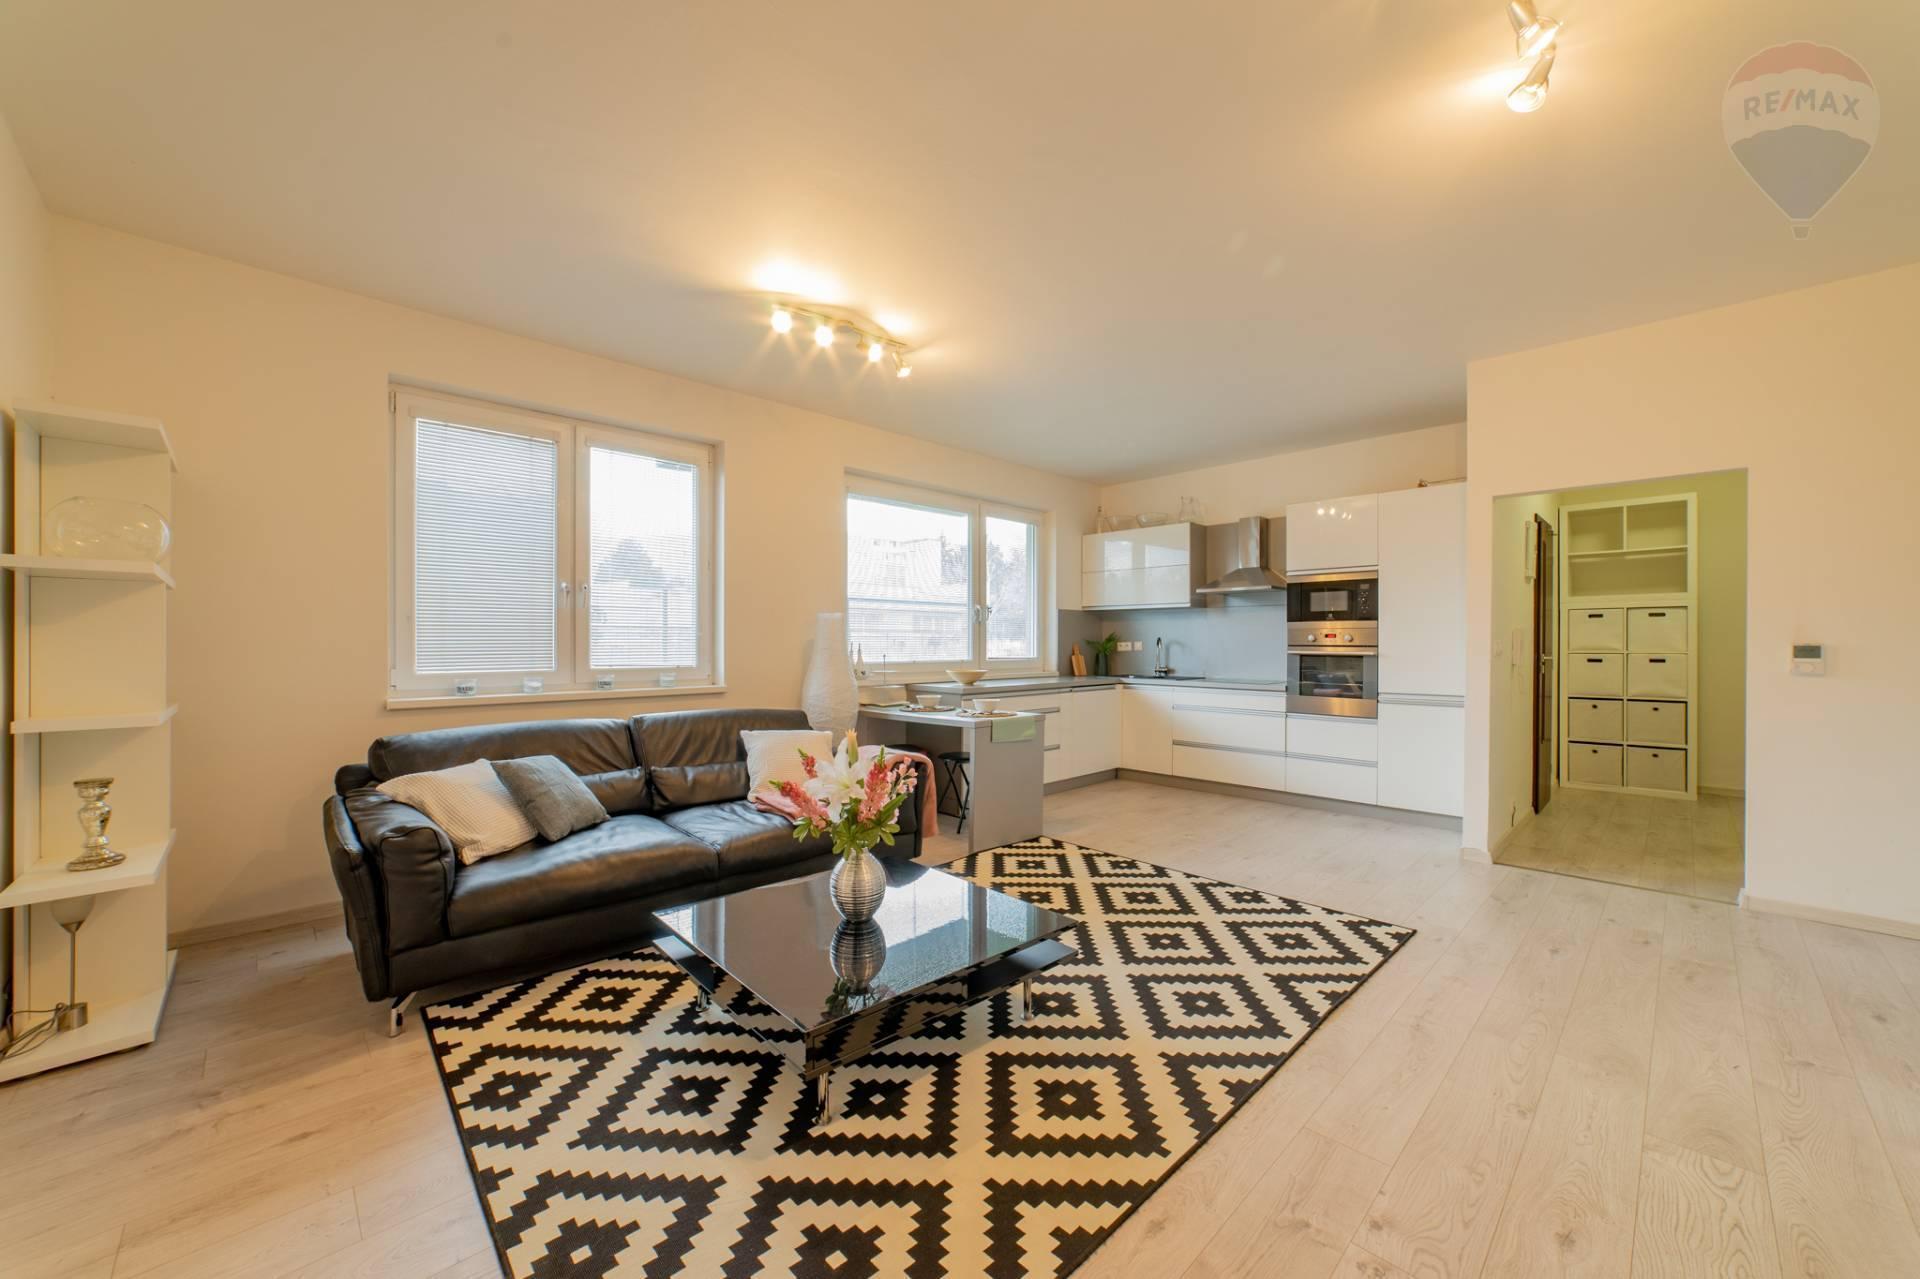 PRENÁJOM >> 2 izbový byt – Podunajská ulica - Podunajské Biskupice